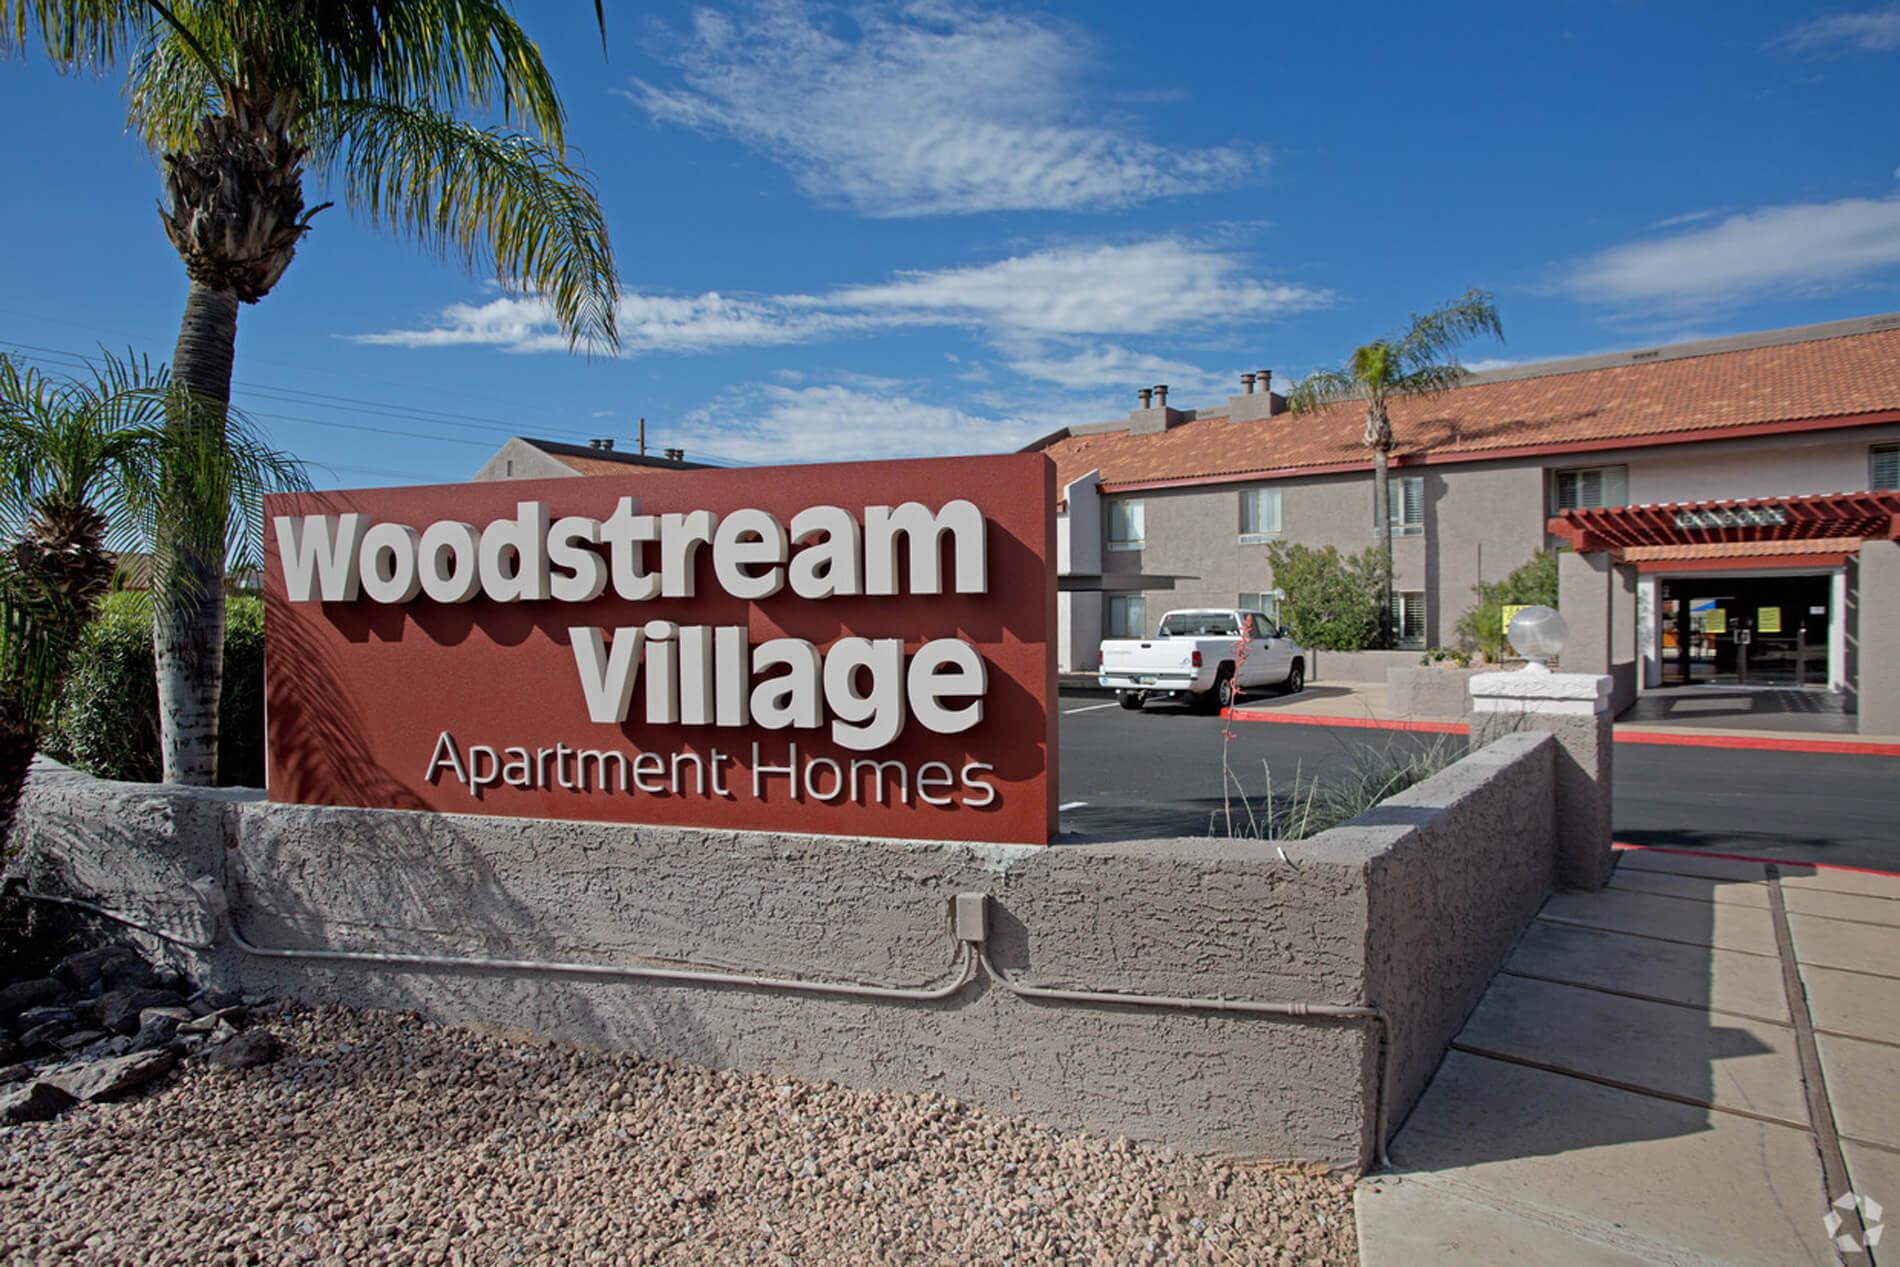 Woodstream Village